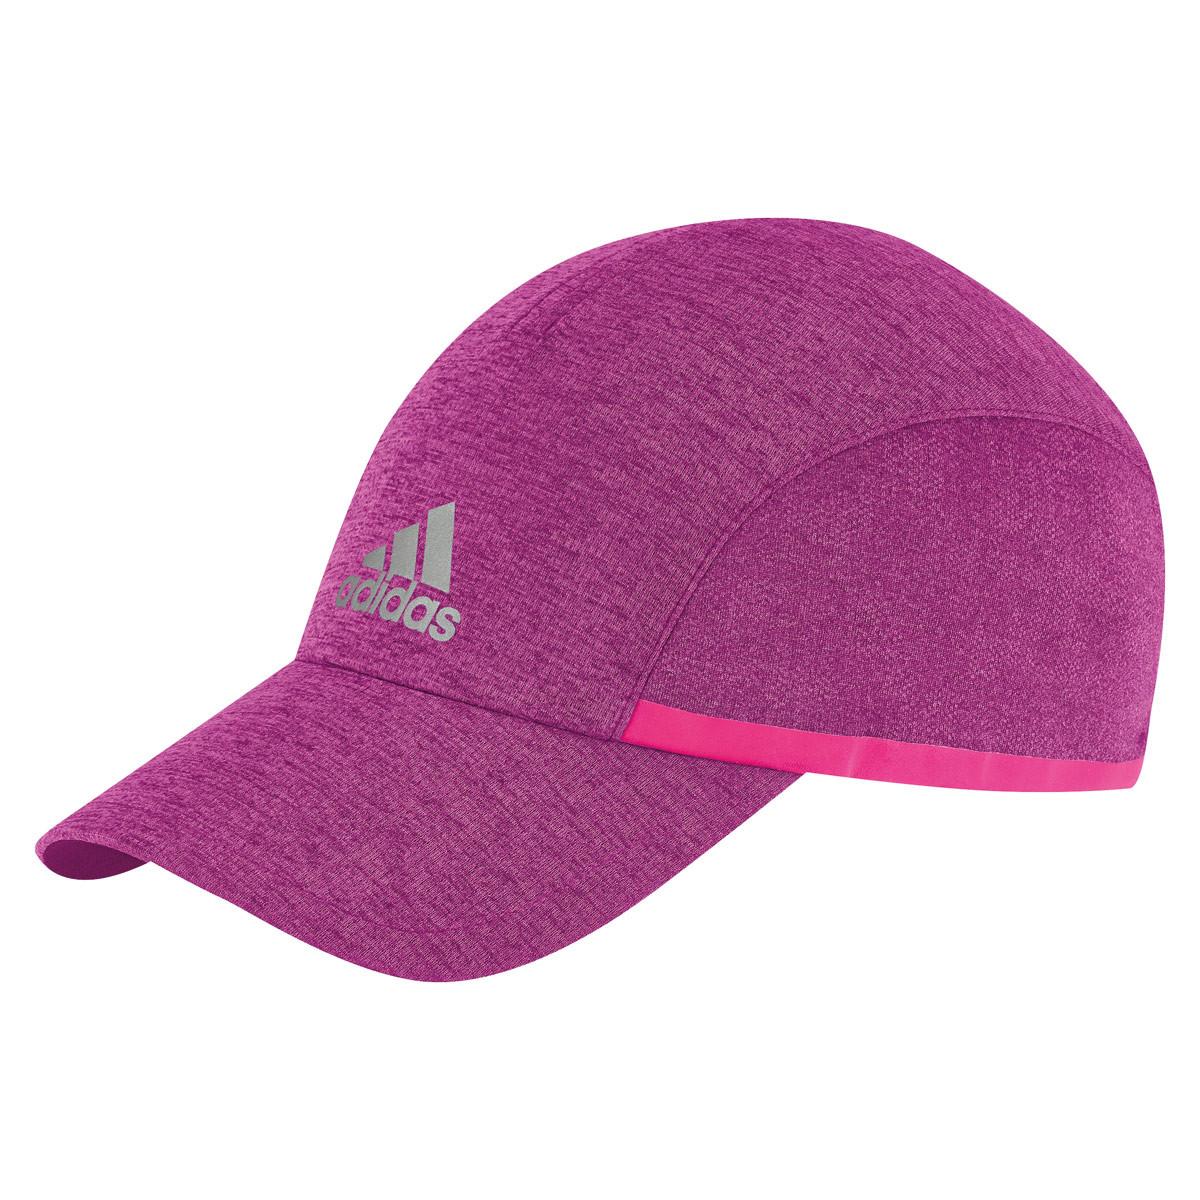 adidas Run Climachill Cap - Kopfbedeckung - Pink